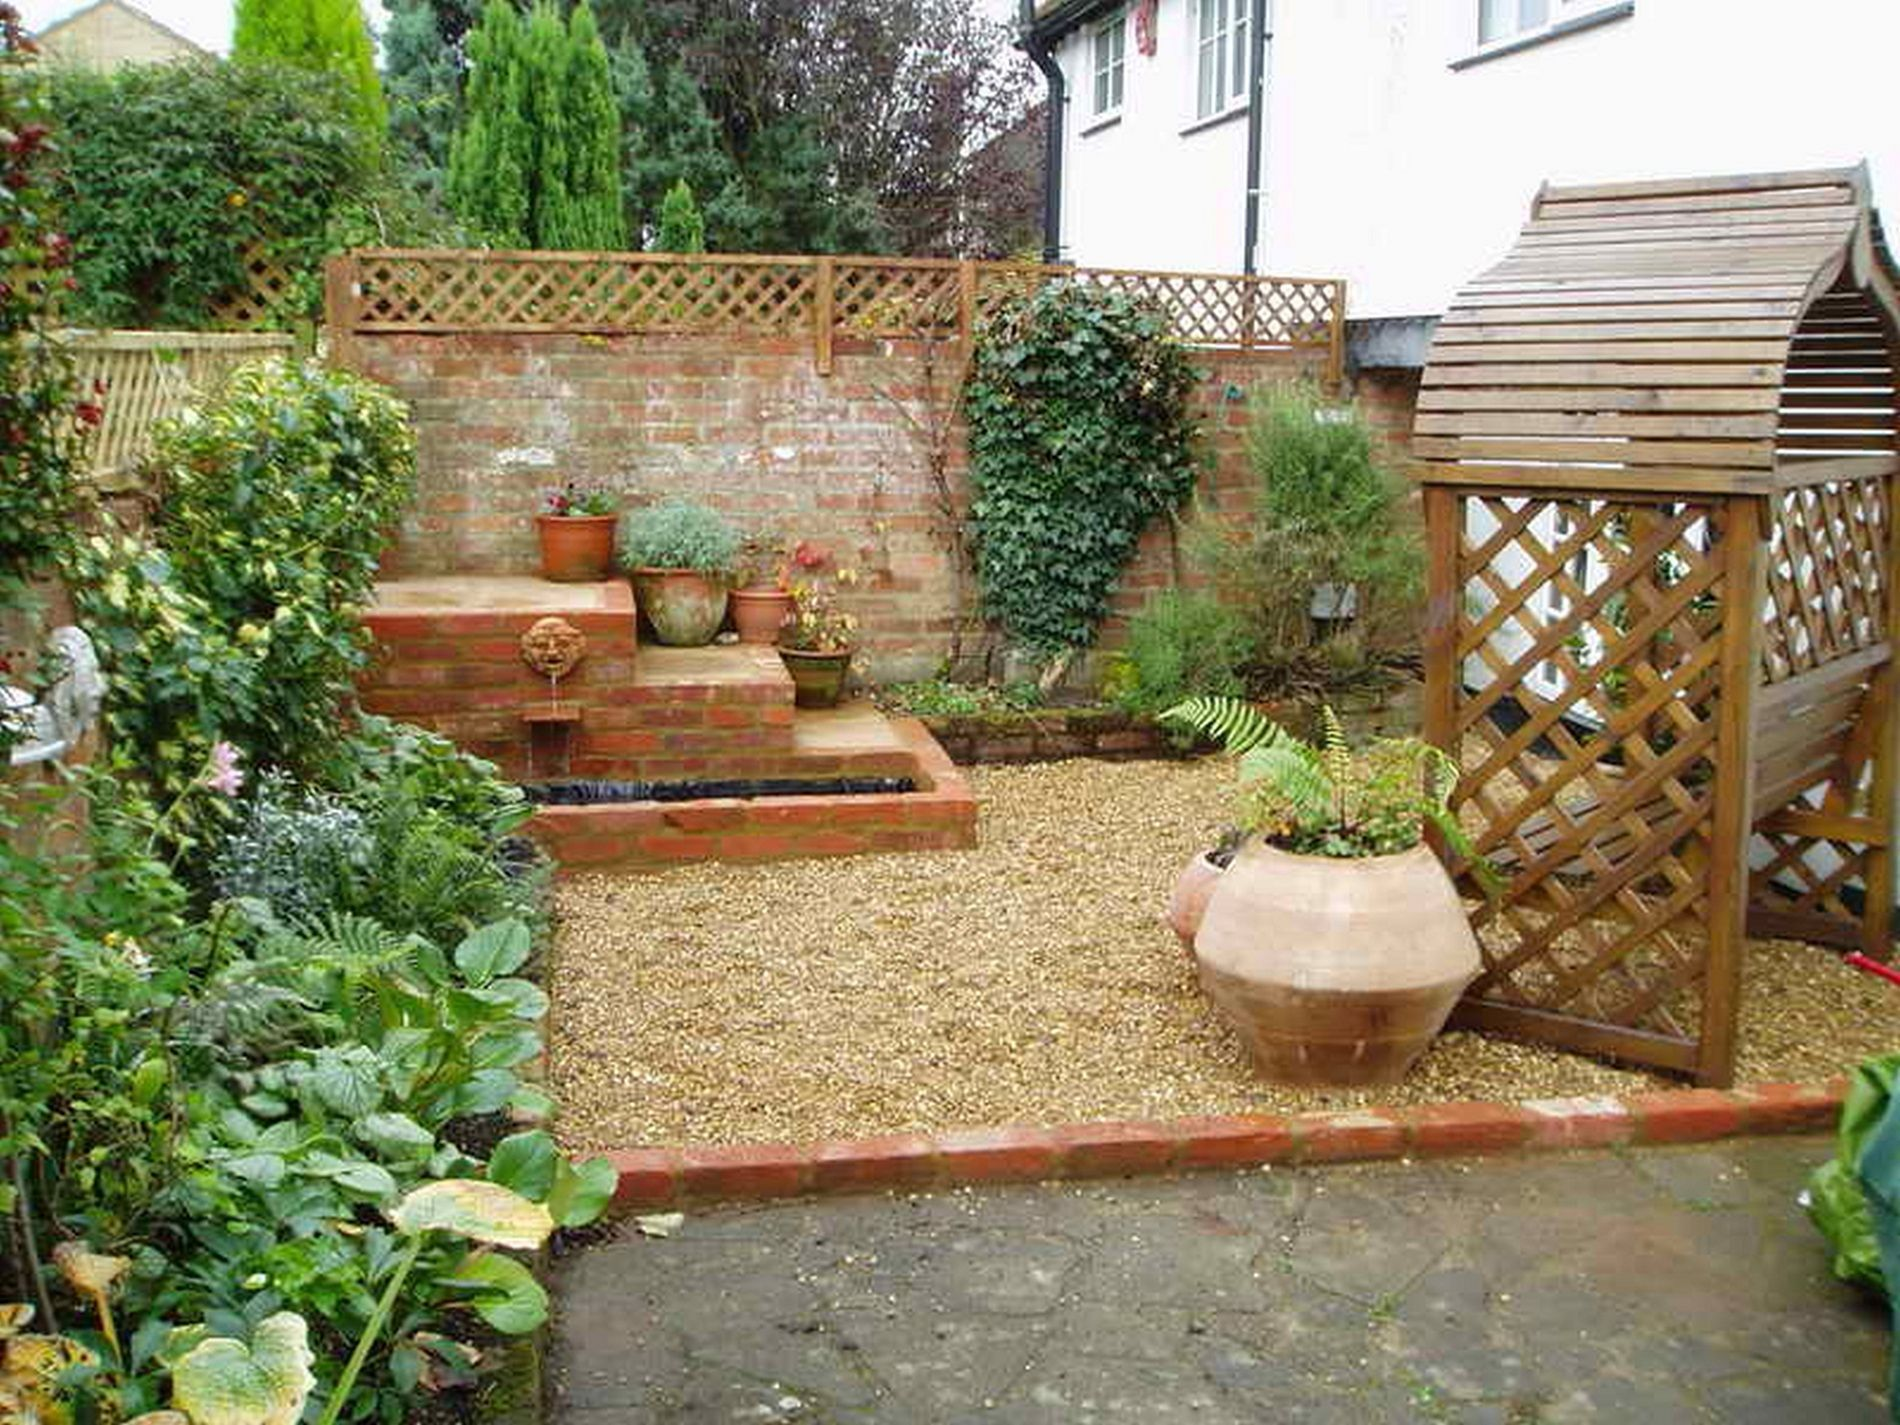 10 Low Cost Garden Ideas Stylish As Well As Stunning Small Backyard Gardens Large Backyard Landscaping Small Backyard